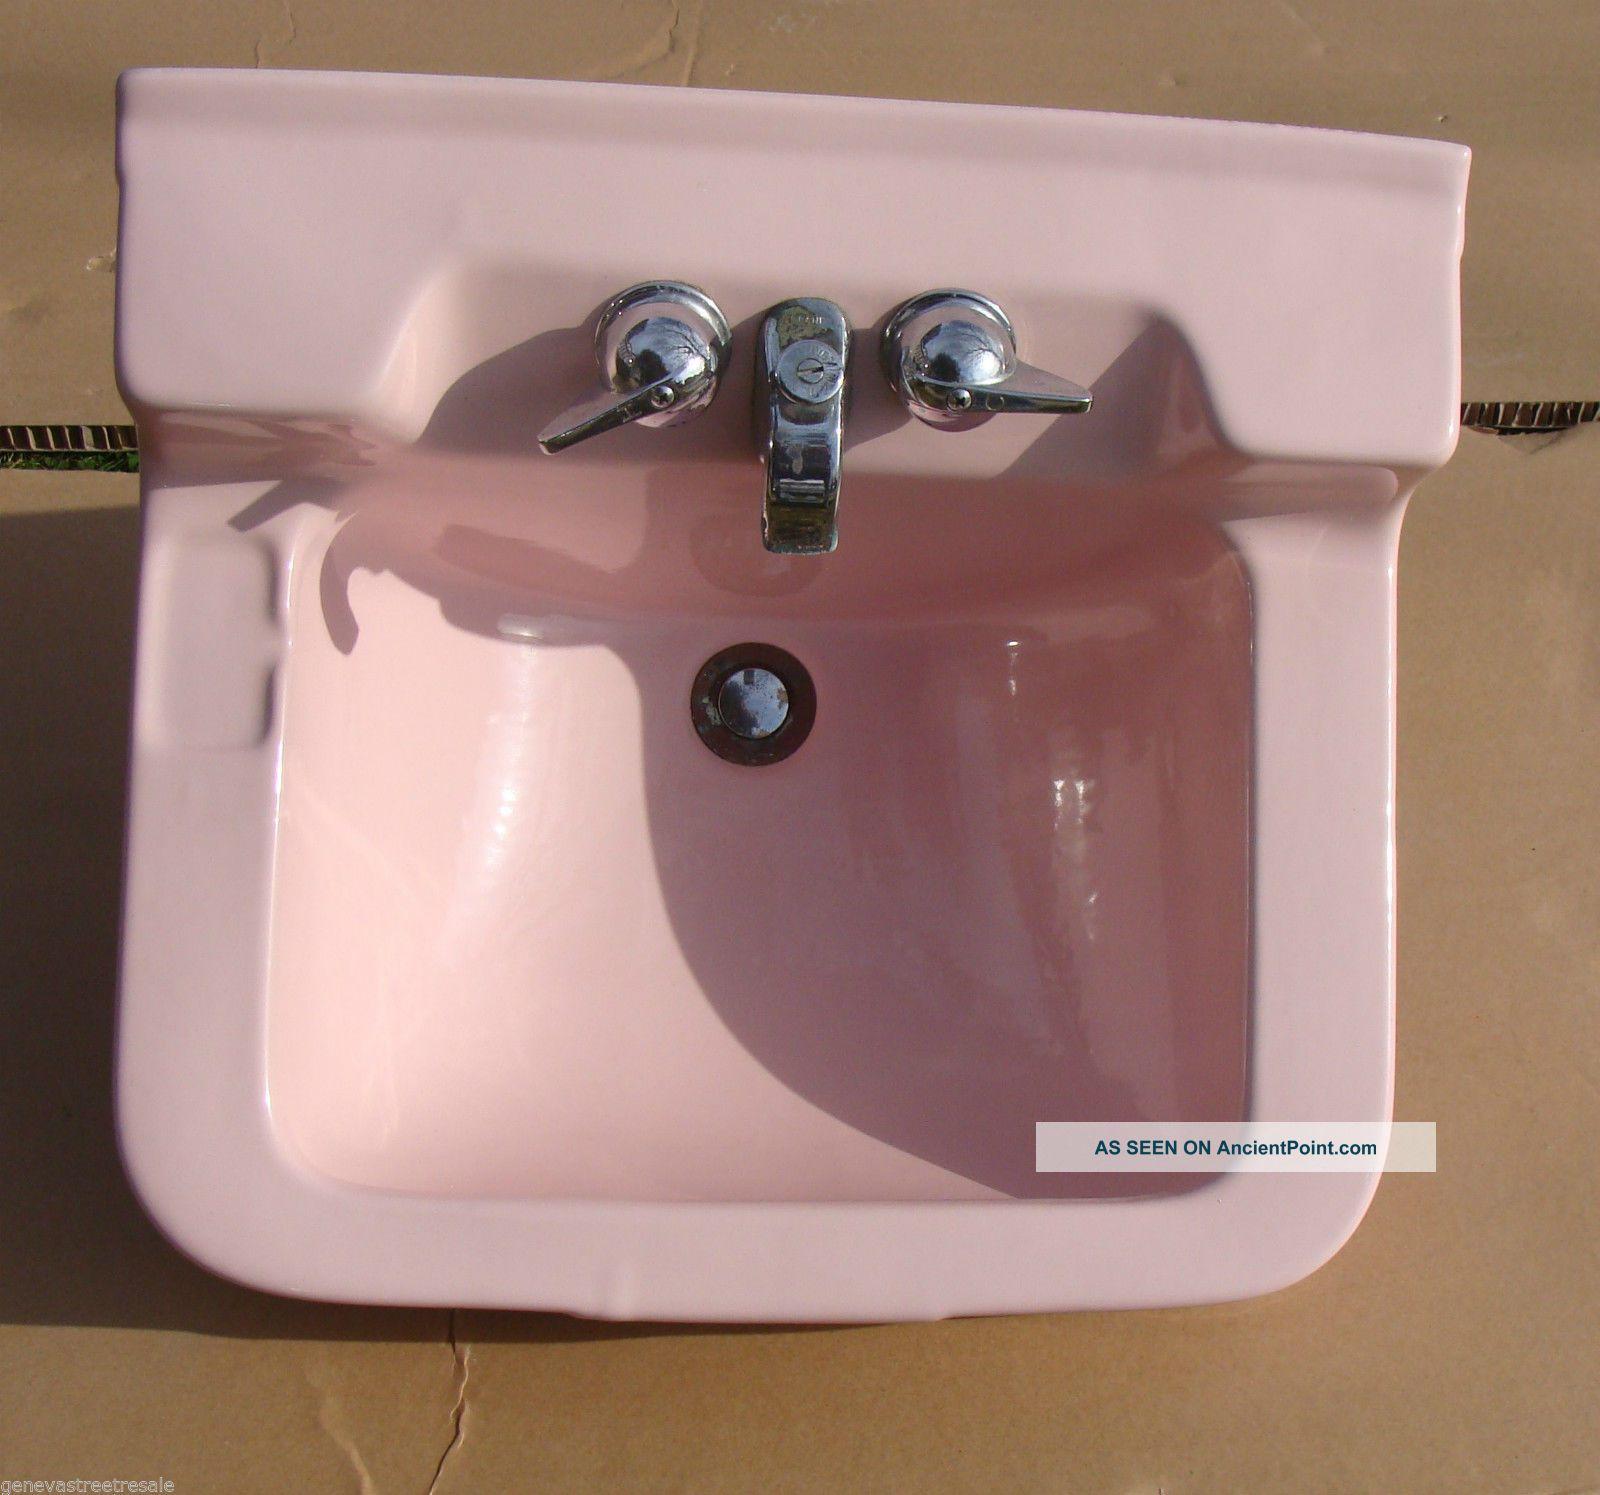 Vintage Crane Oxford Retro Pink Bathroom Kitchen Porcelain Sink Mid Century Sinks photo